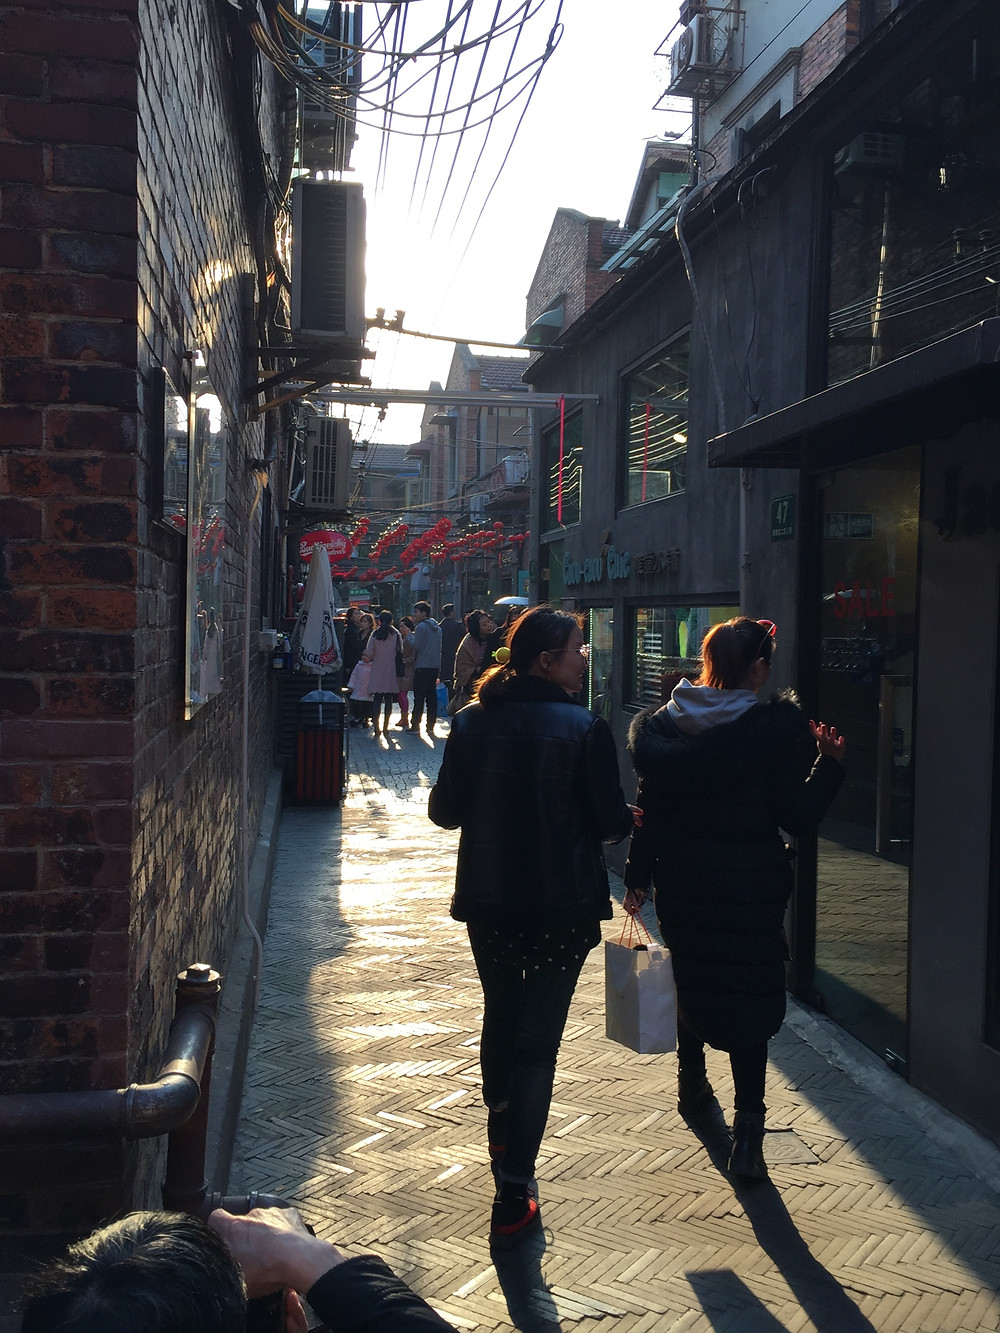 Alleyway in Tianzifang